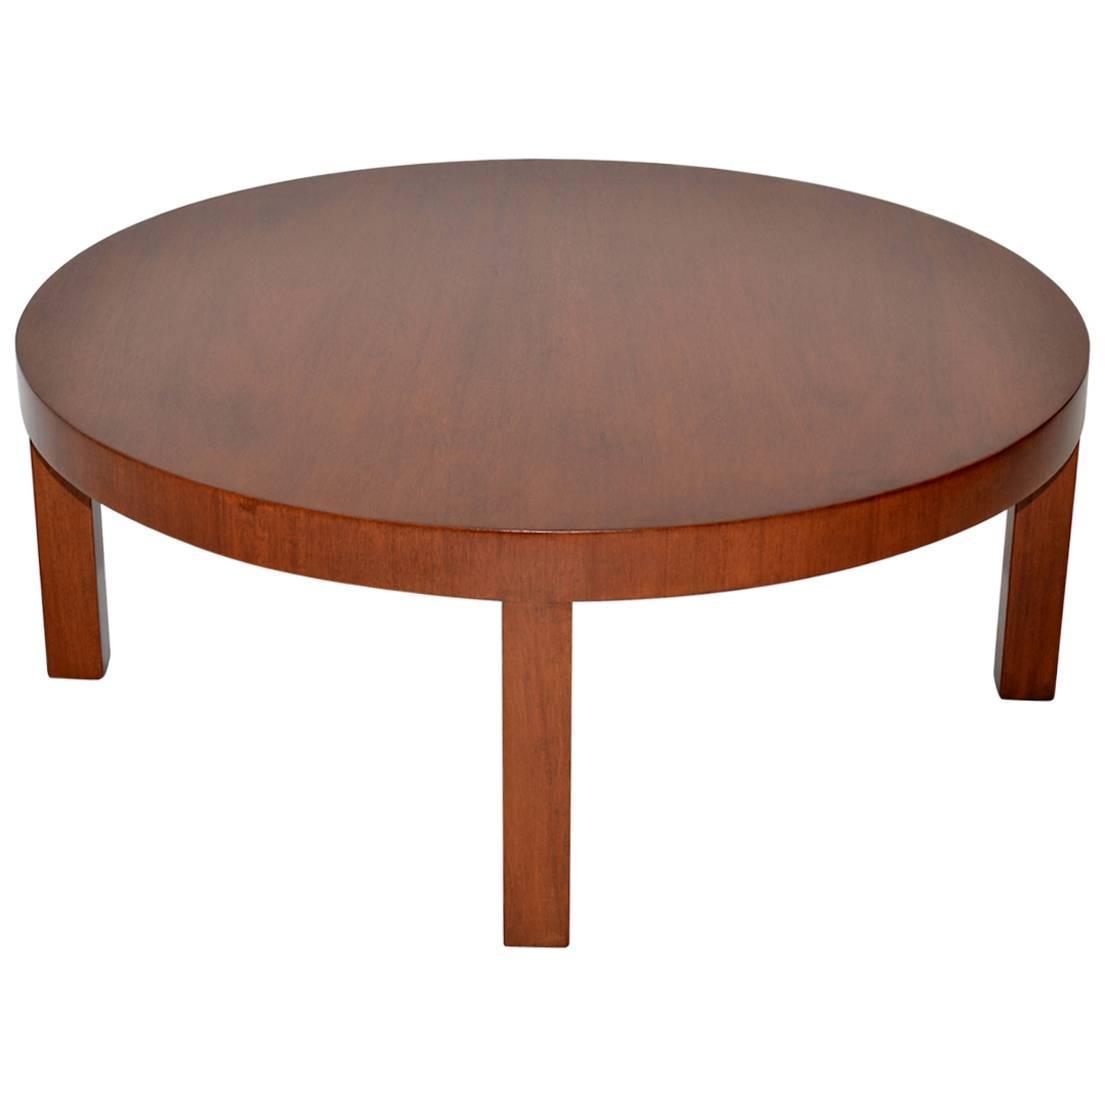 Minimalist Robsjohn Gibbings Coffee Table In Mahogany For Sale At 1stdibs